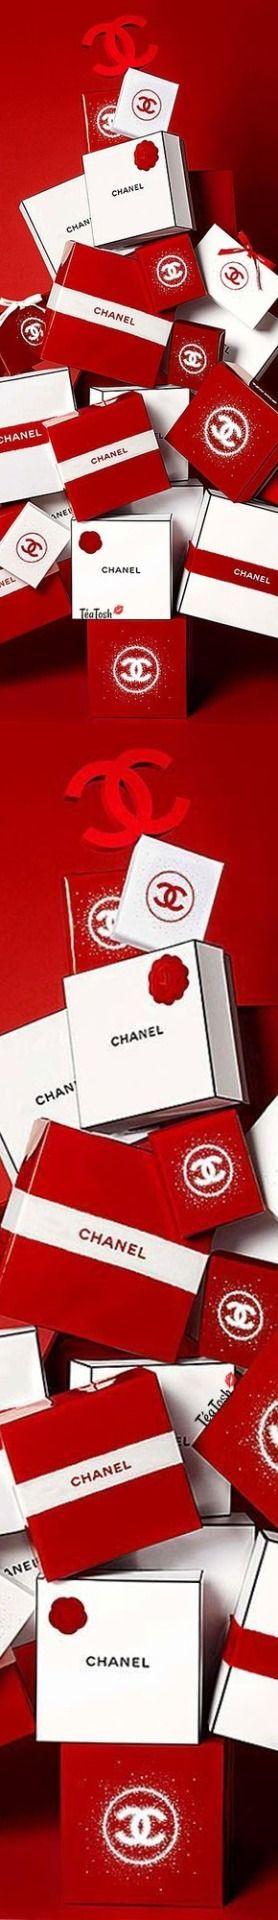 Téa Tosh Chanel #Chanel #chanelbeaute #christmasmood # ...